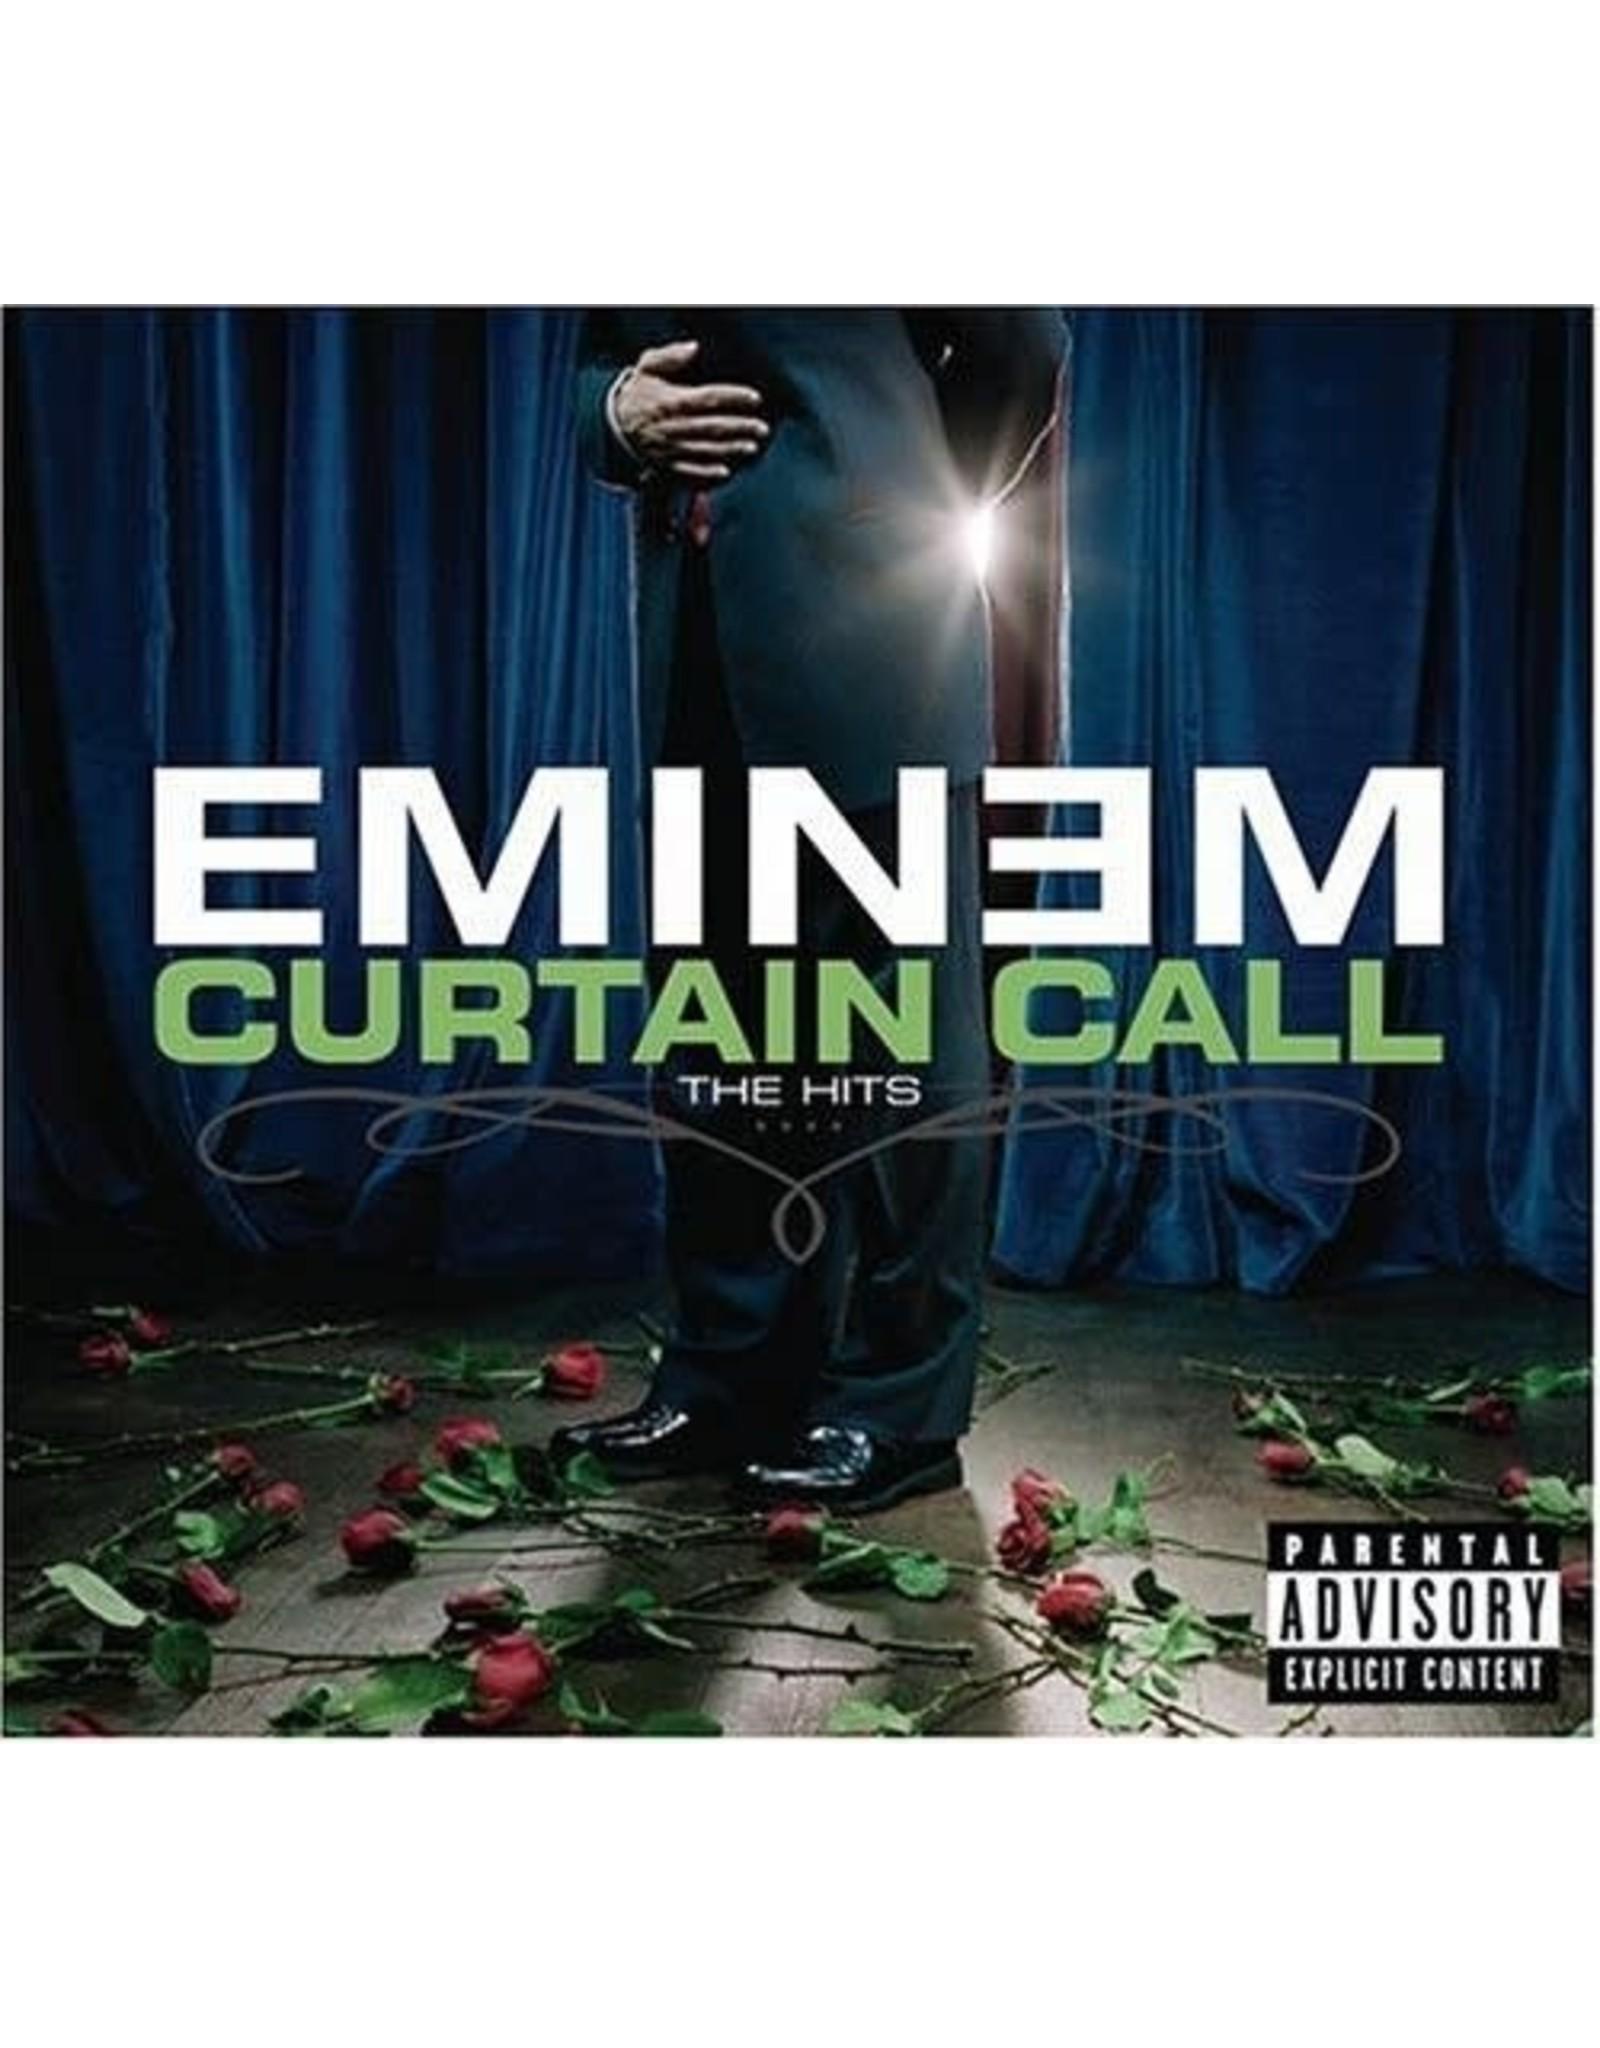 Eminem - Curtain Call LP